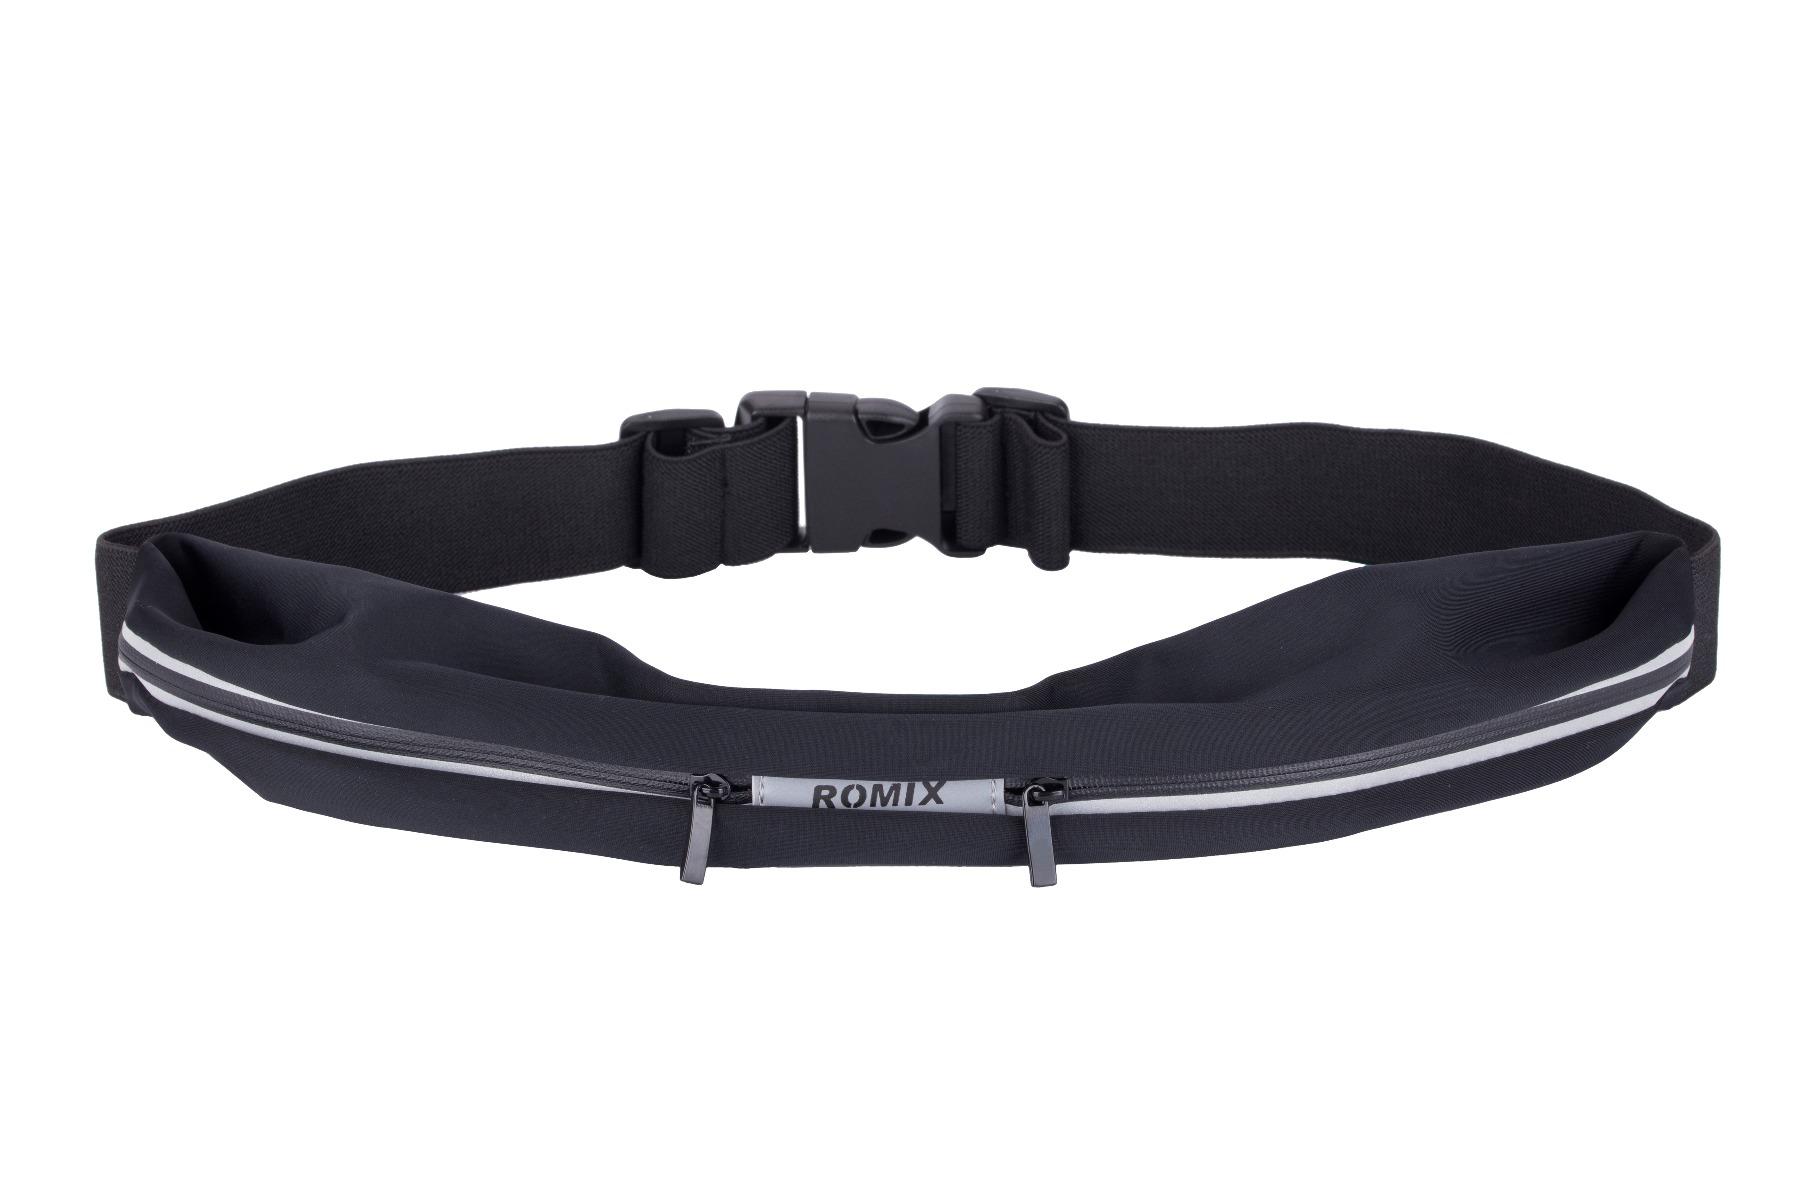 Romix Runners Belts - Outdoor Sports Waterproof Waist Double Bag for Phone